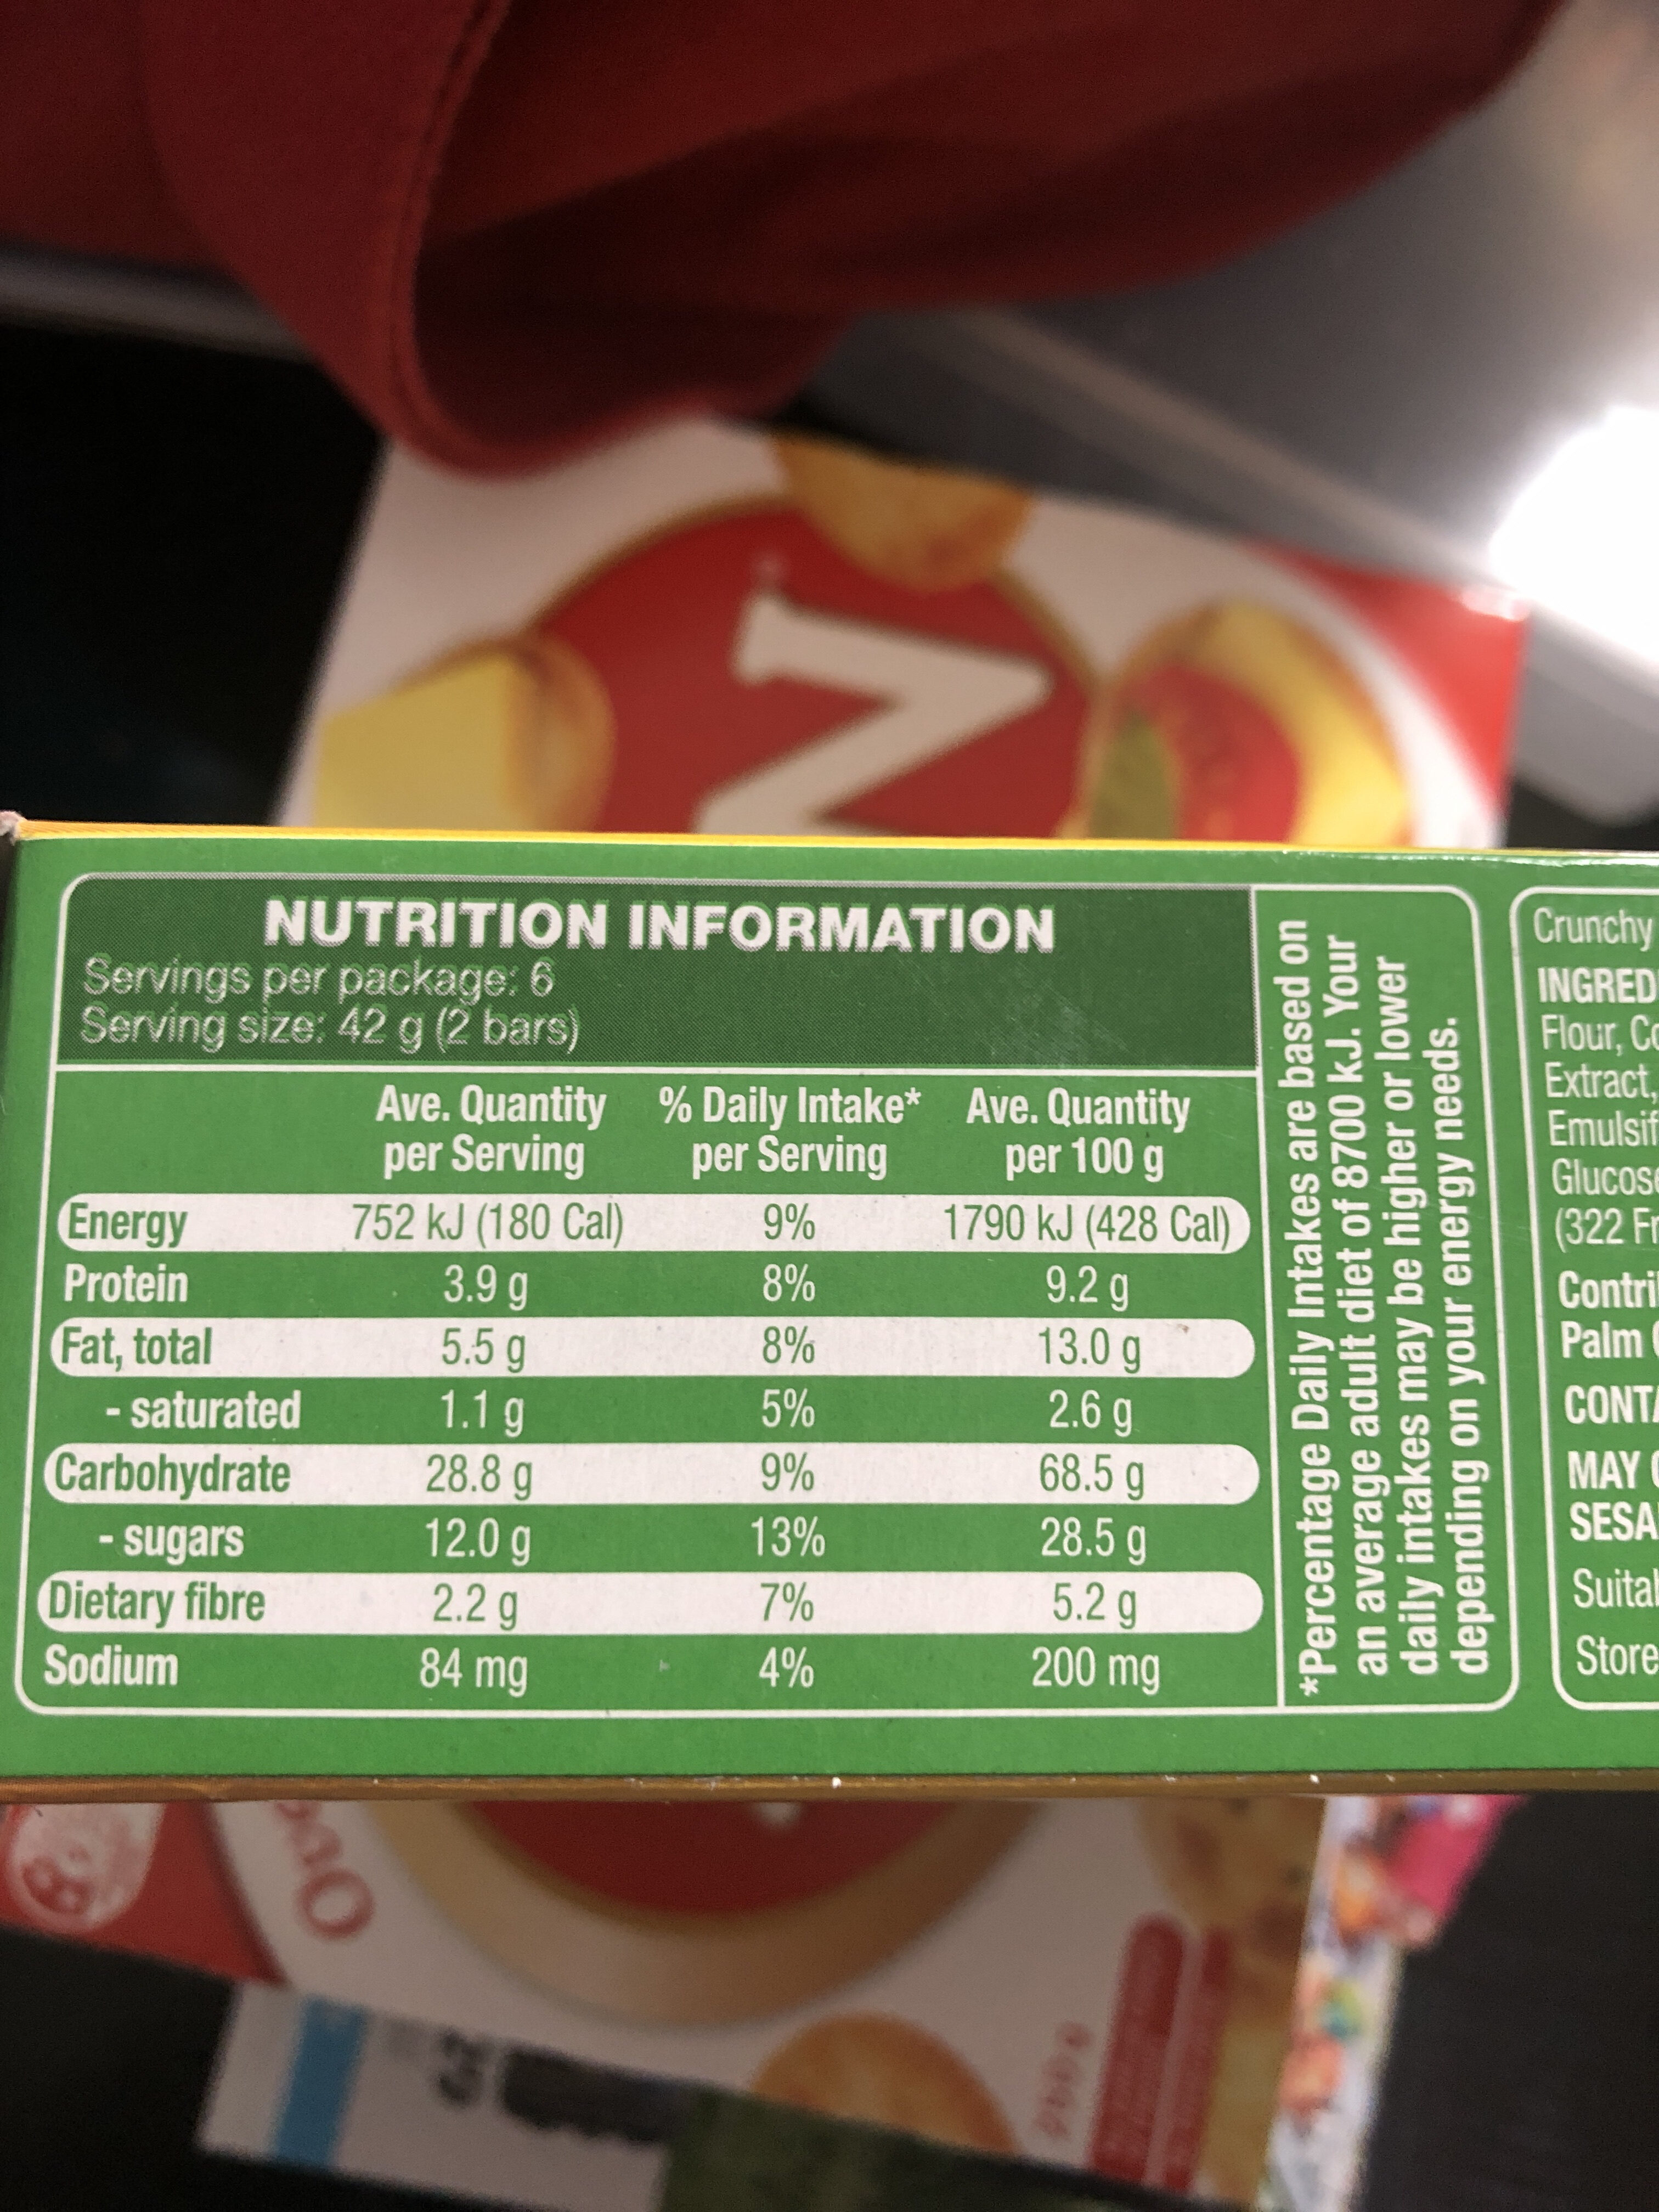 Crunchy granola bars - Nutrition facts